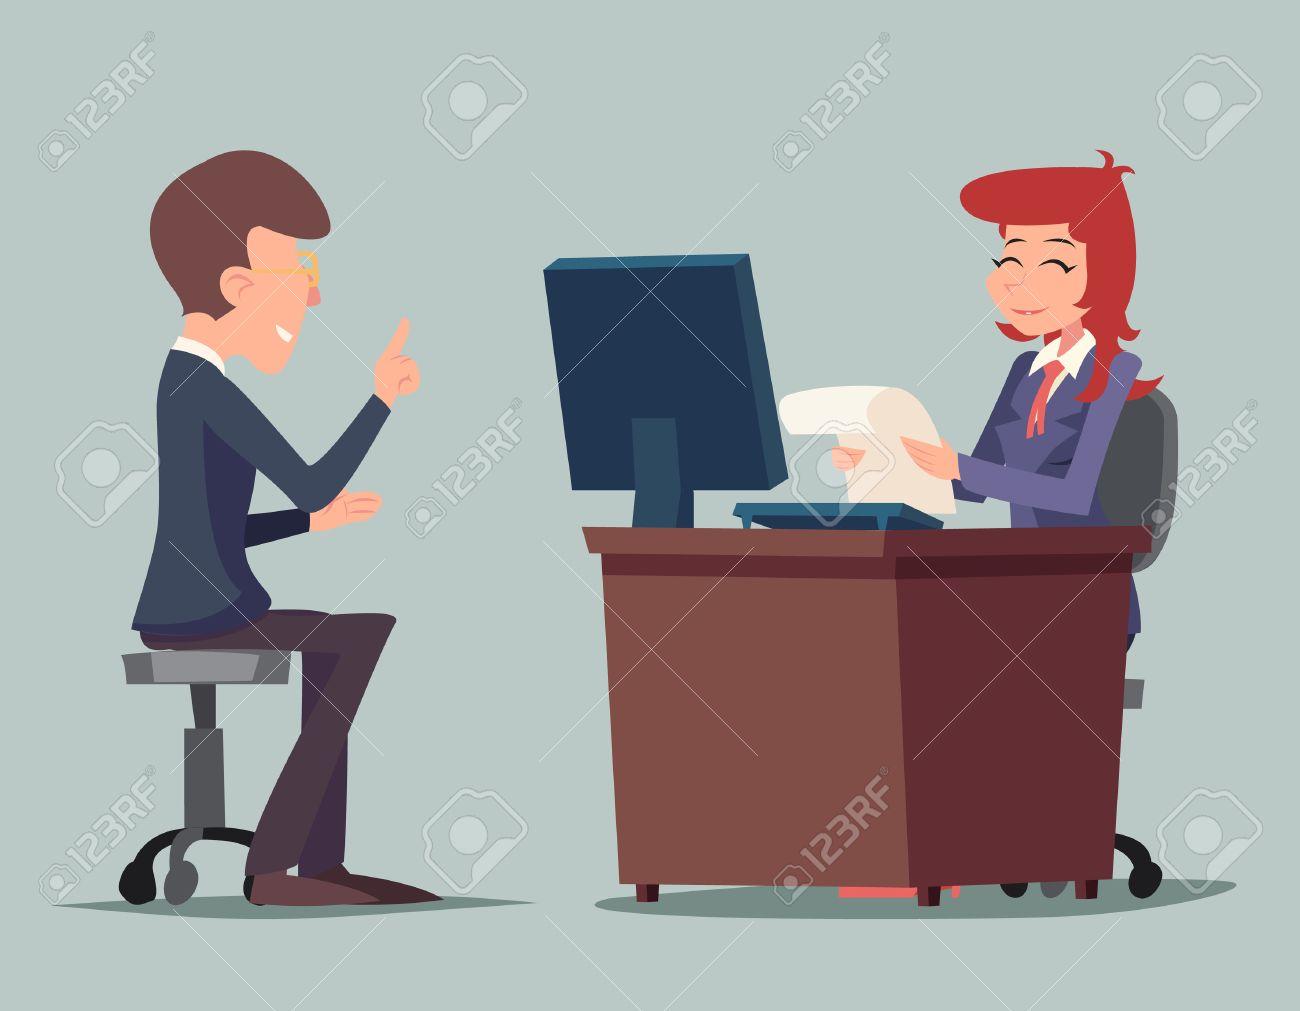 Task Conversation Job Interview Businessman at Desk Working on Computer Cartoon Characters Icon Stylish Background Retro Cartoon Design Vector Illustration - 50631344